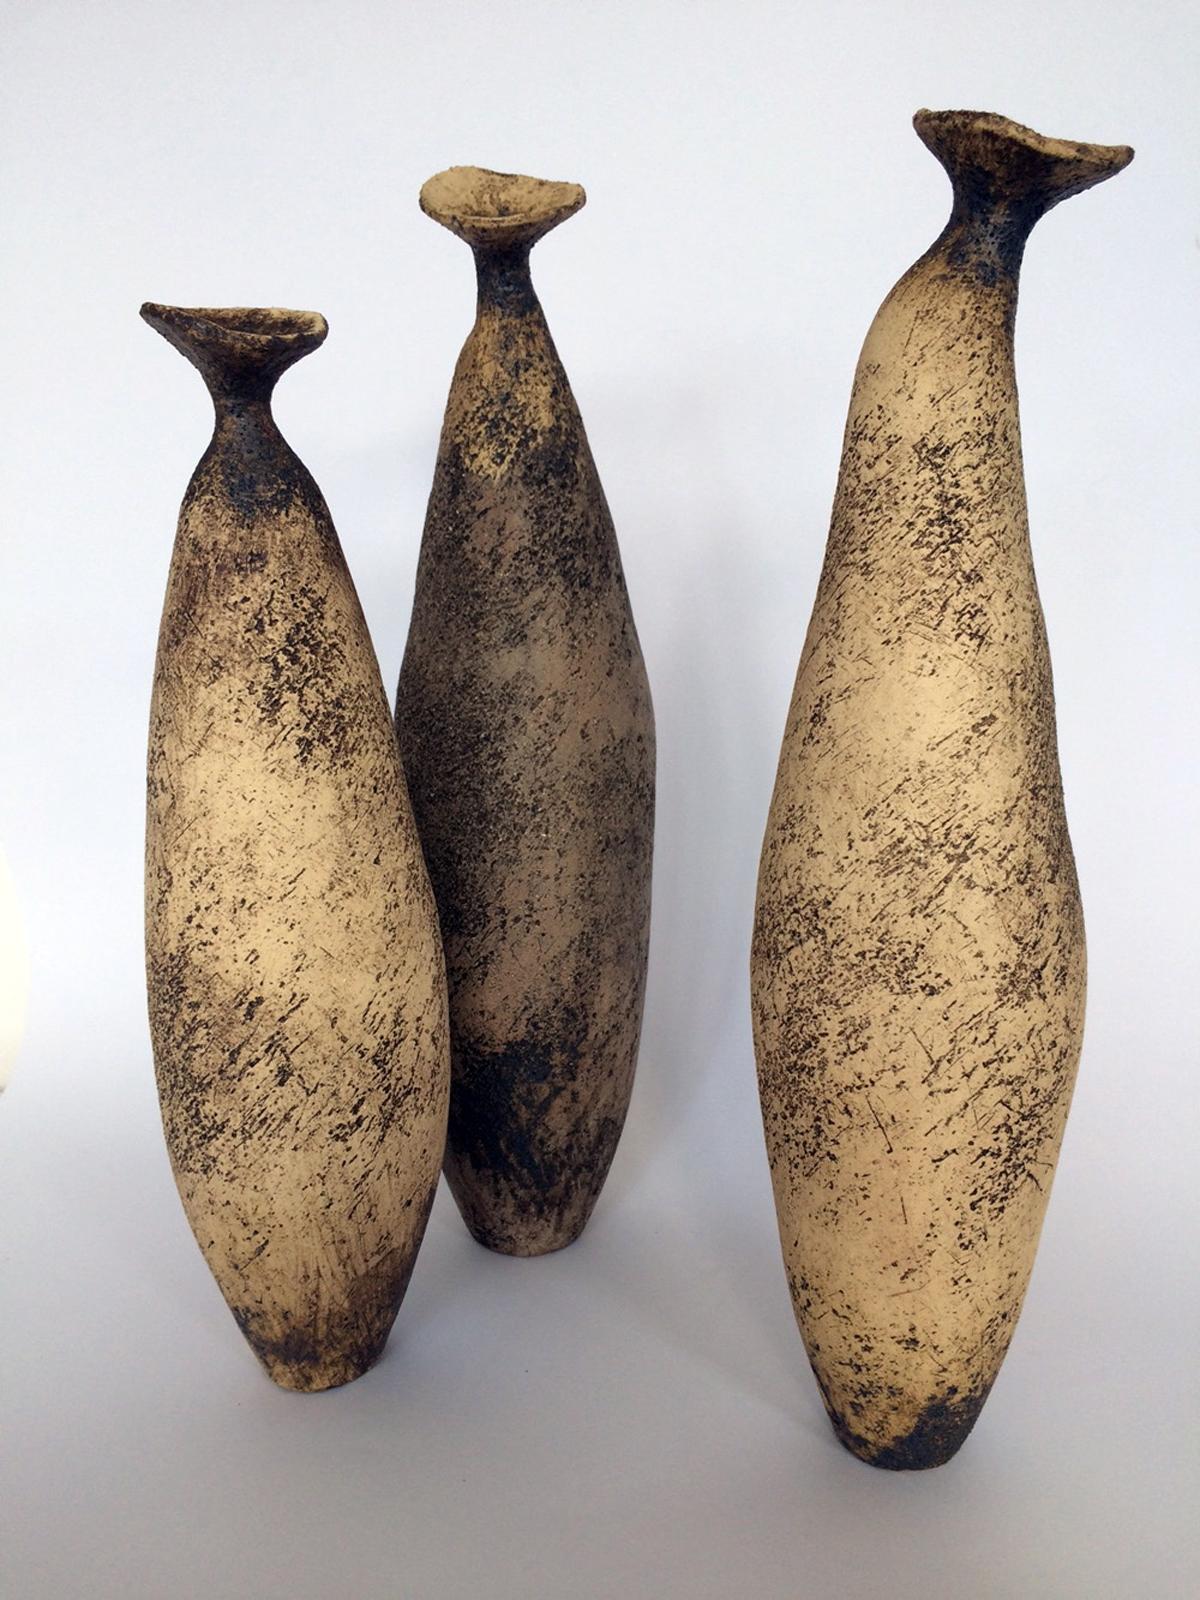 Image B stoneware vessels Julie O'Sullivan.jpg